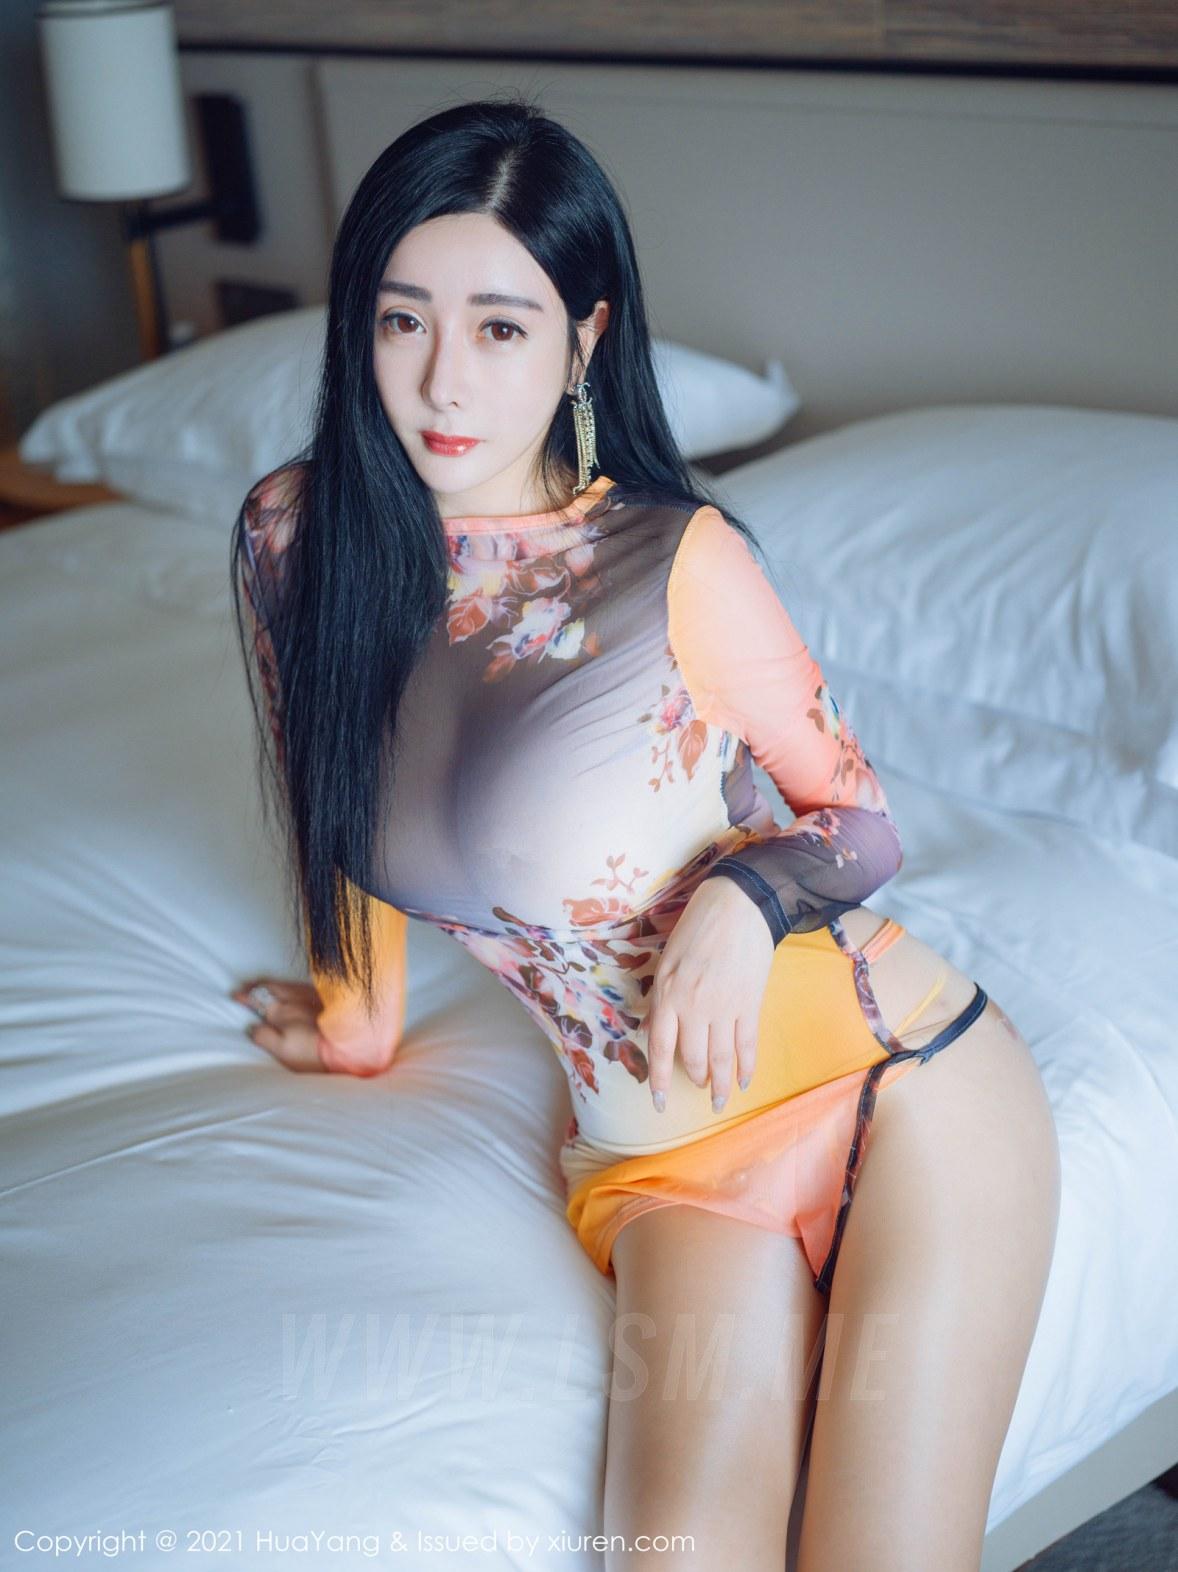 HuaYang 花漾show Vol.427 轻透情趣 允爾 三亚旅拍 - 4